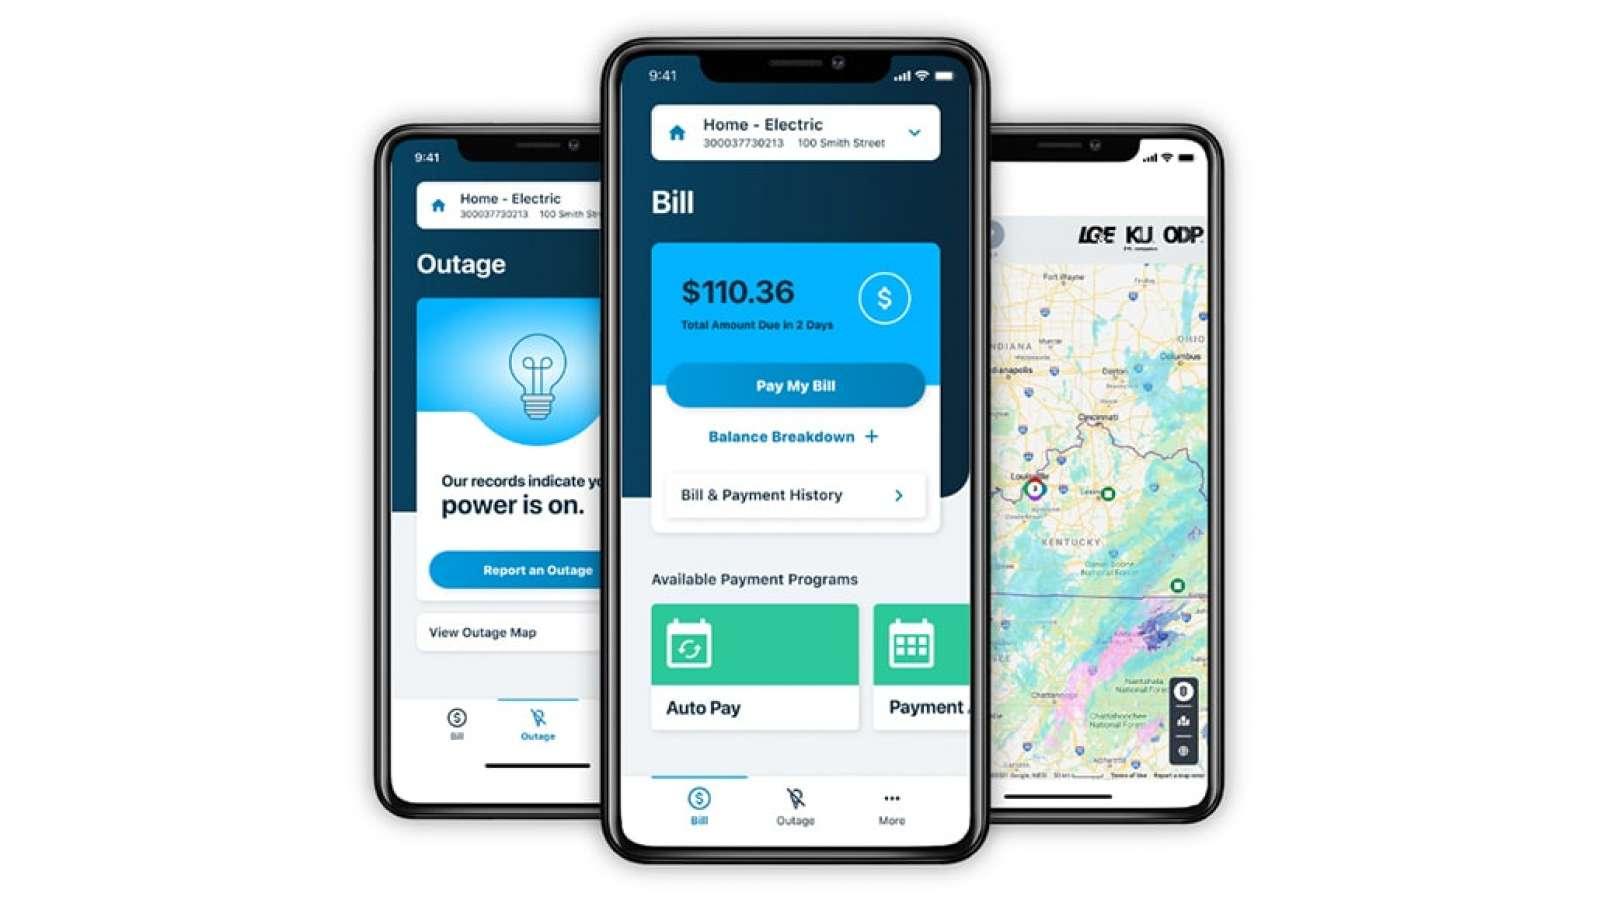 LG&E and KU mobile app screens